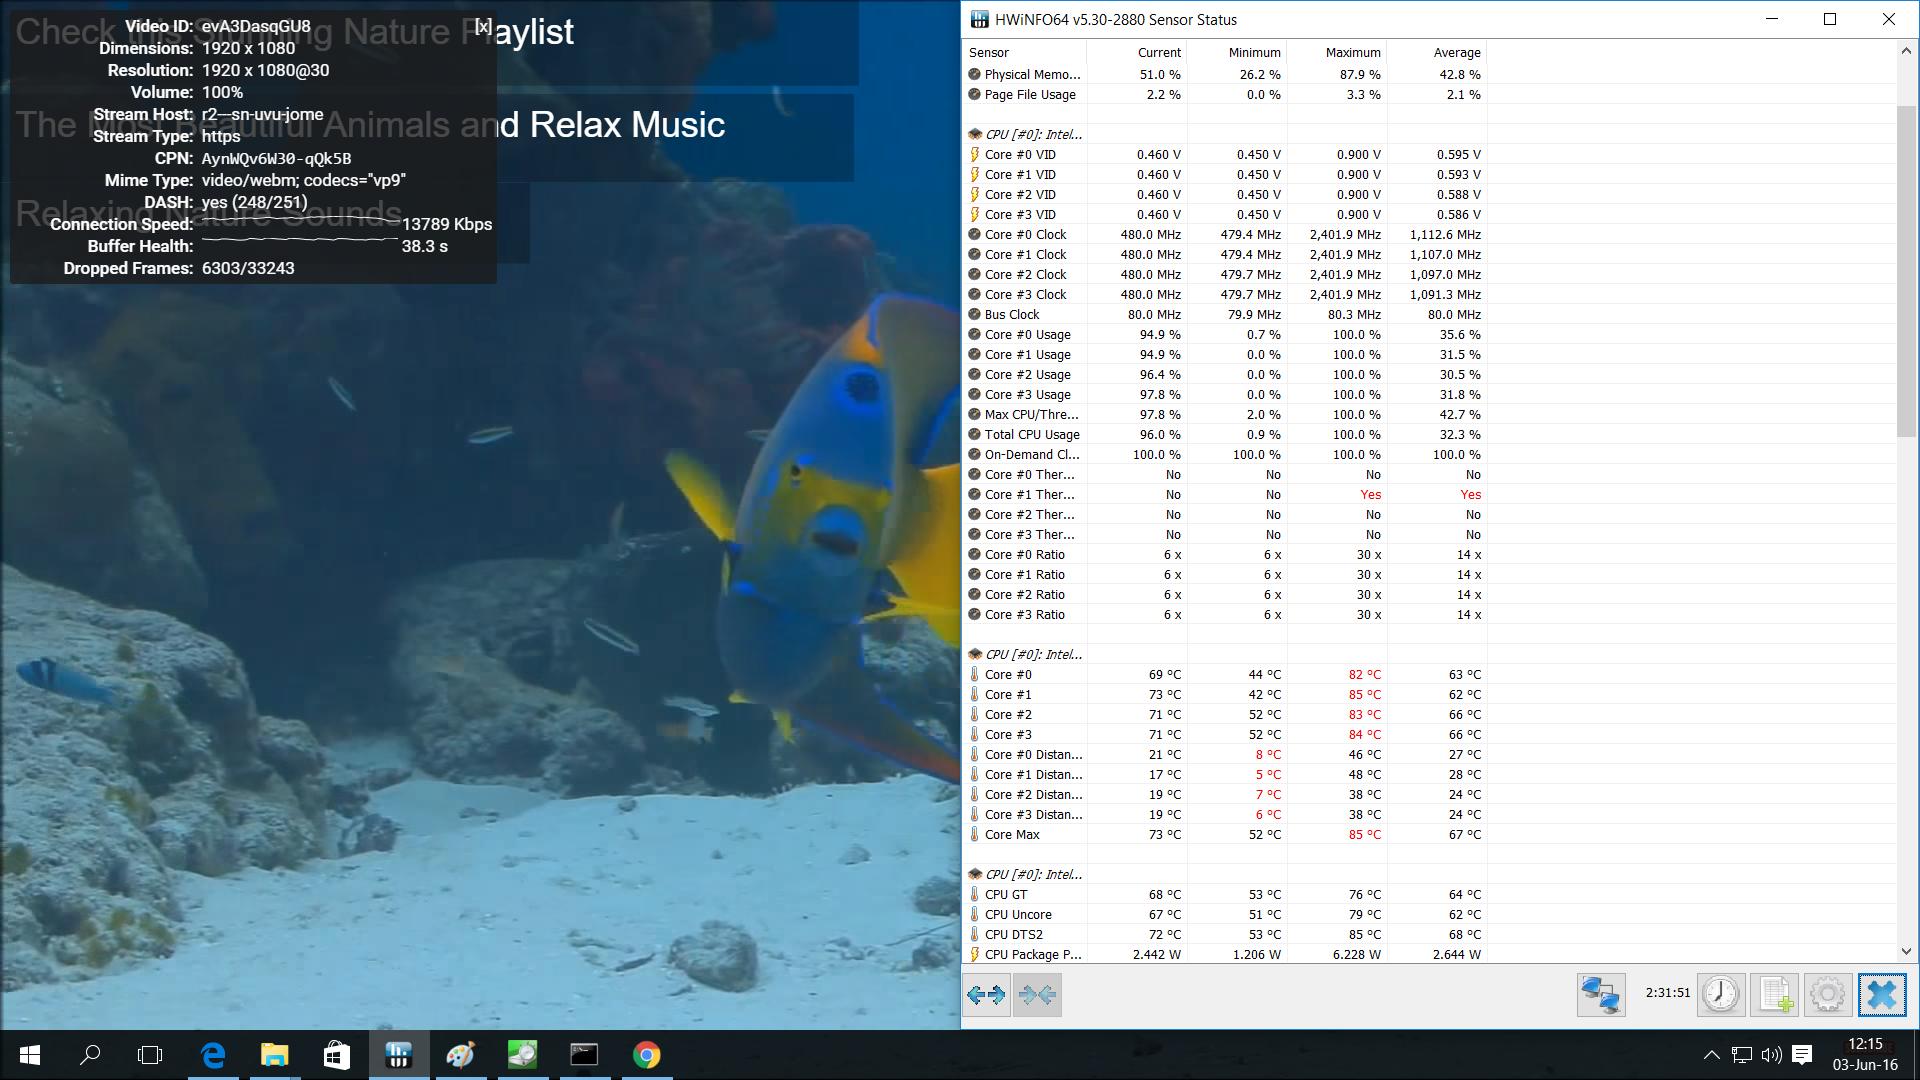 Beelink BT7 Review - Windows 10 mini PC Based on Intel Atom